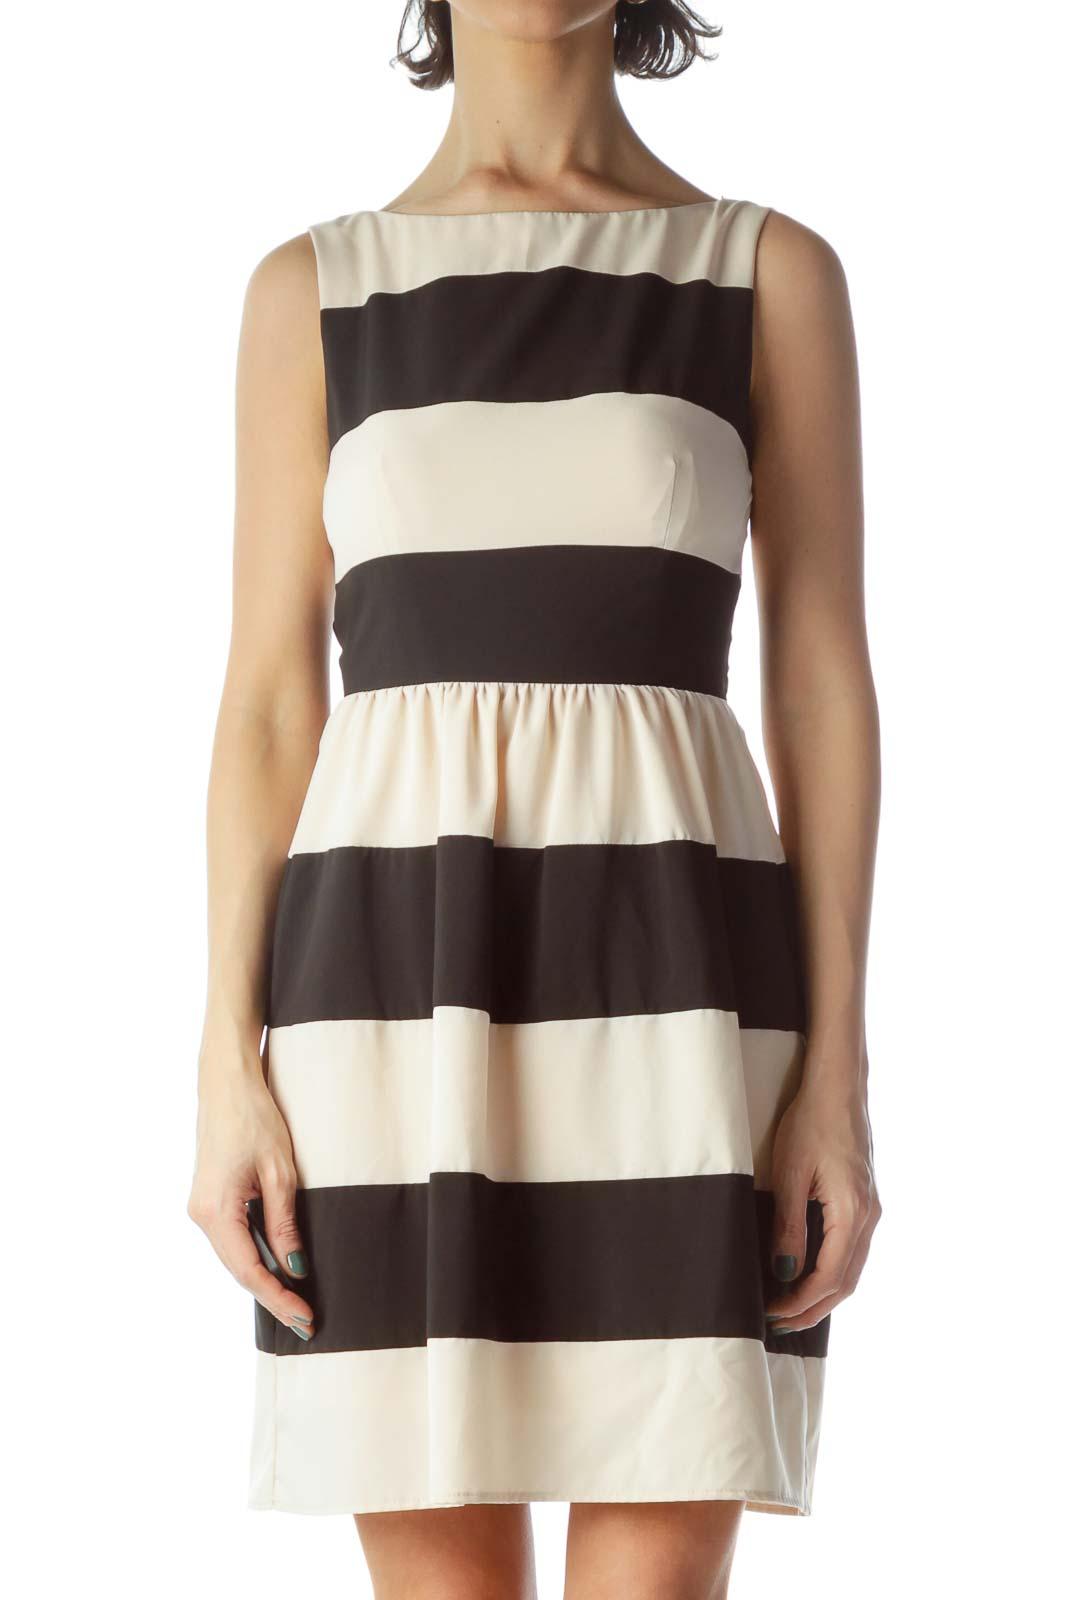 Black Beige Striped Dress Front